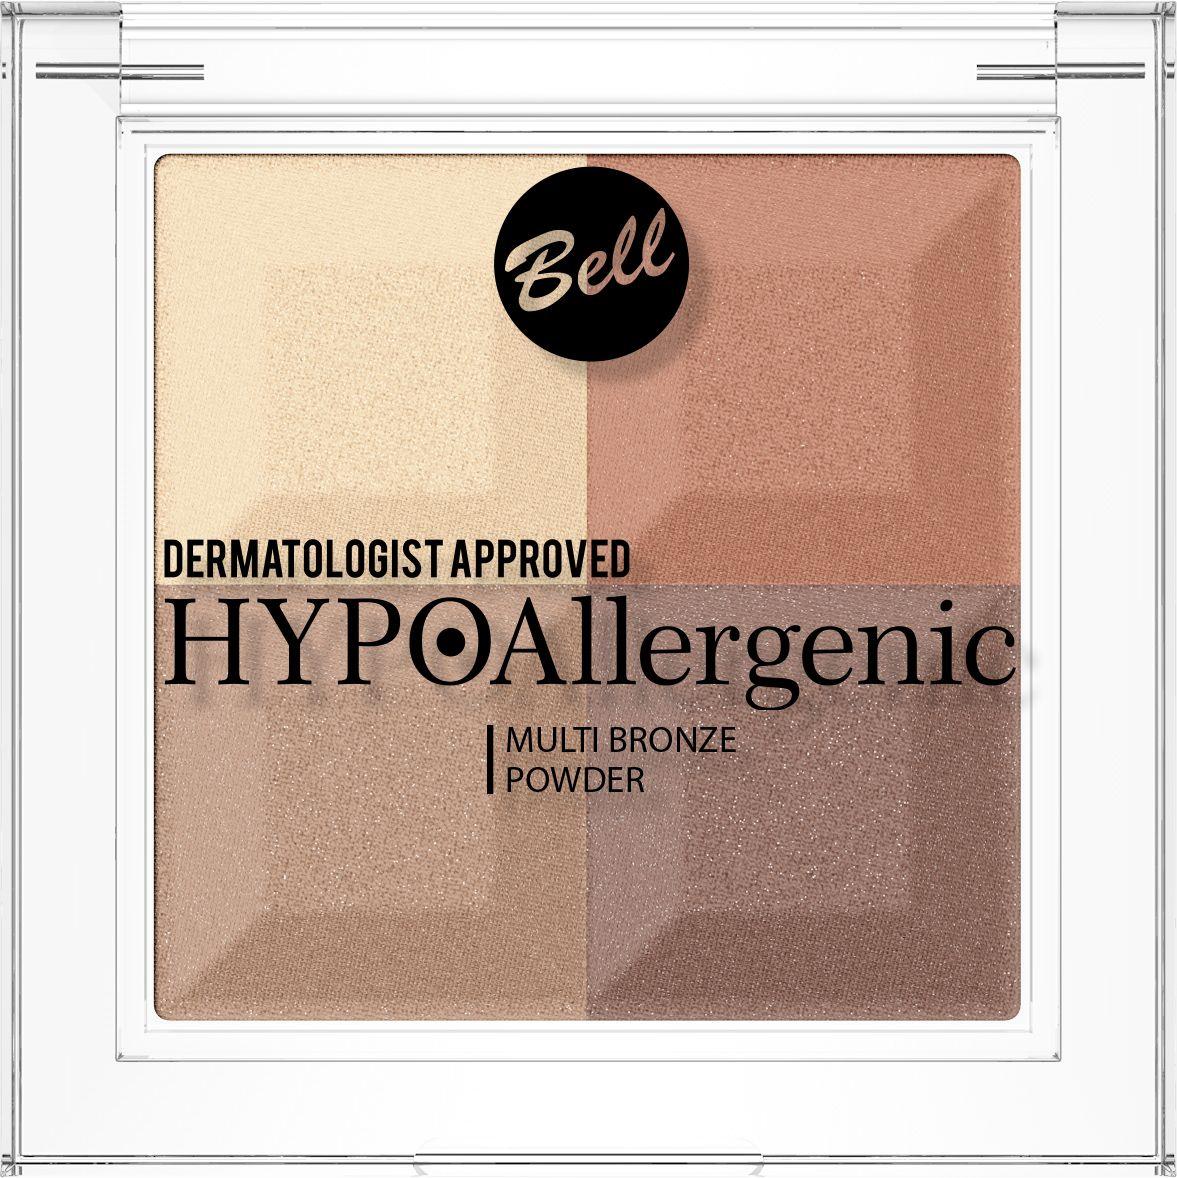 Фото - Bell Hypoallergenic Пудра с бронзирующим и осветляющим эффектом Multi Bronze Powder, Тон №03 пудра bell bell be091lwelfk8